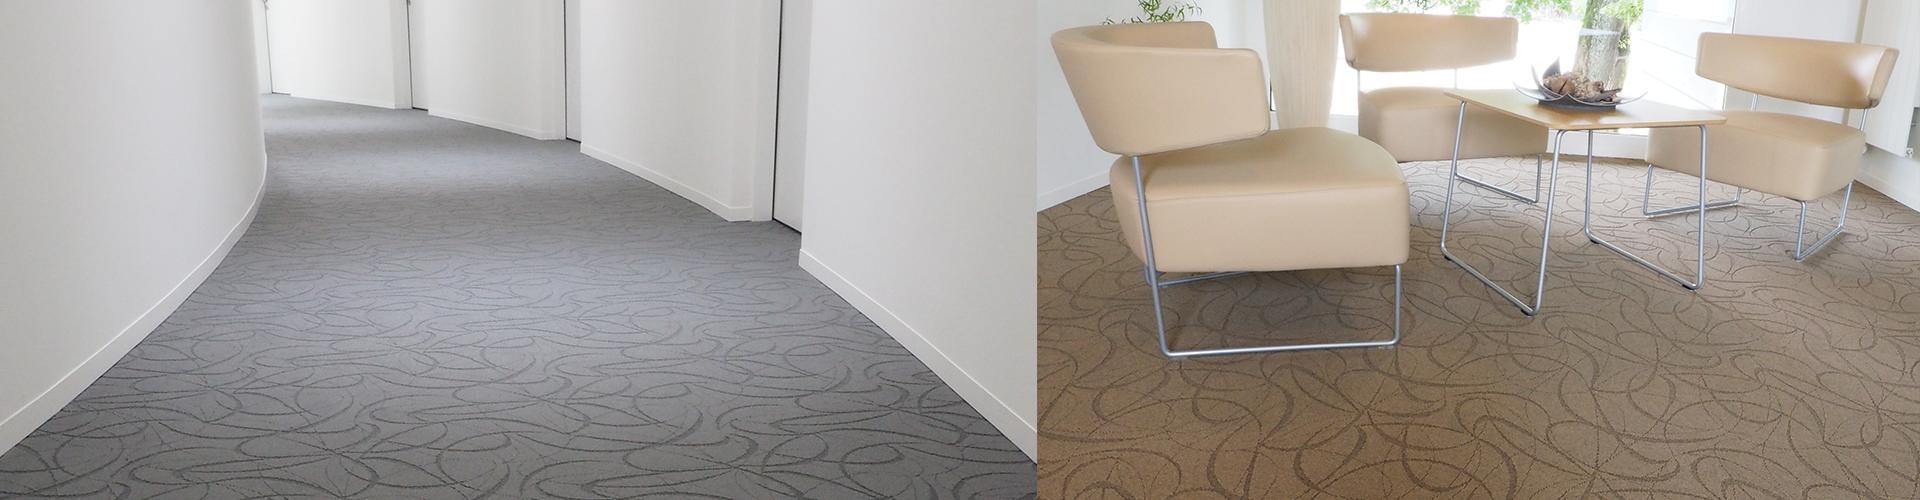 laminat teppich profil laminat teppich xxcm alu geriffelt with laminat teppich laminat with. Black Bedroom Furniture Sets. Home Design Ideas